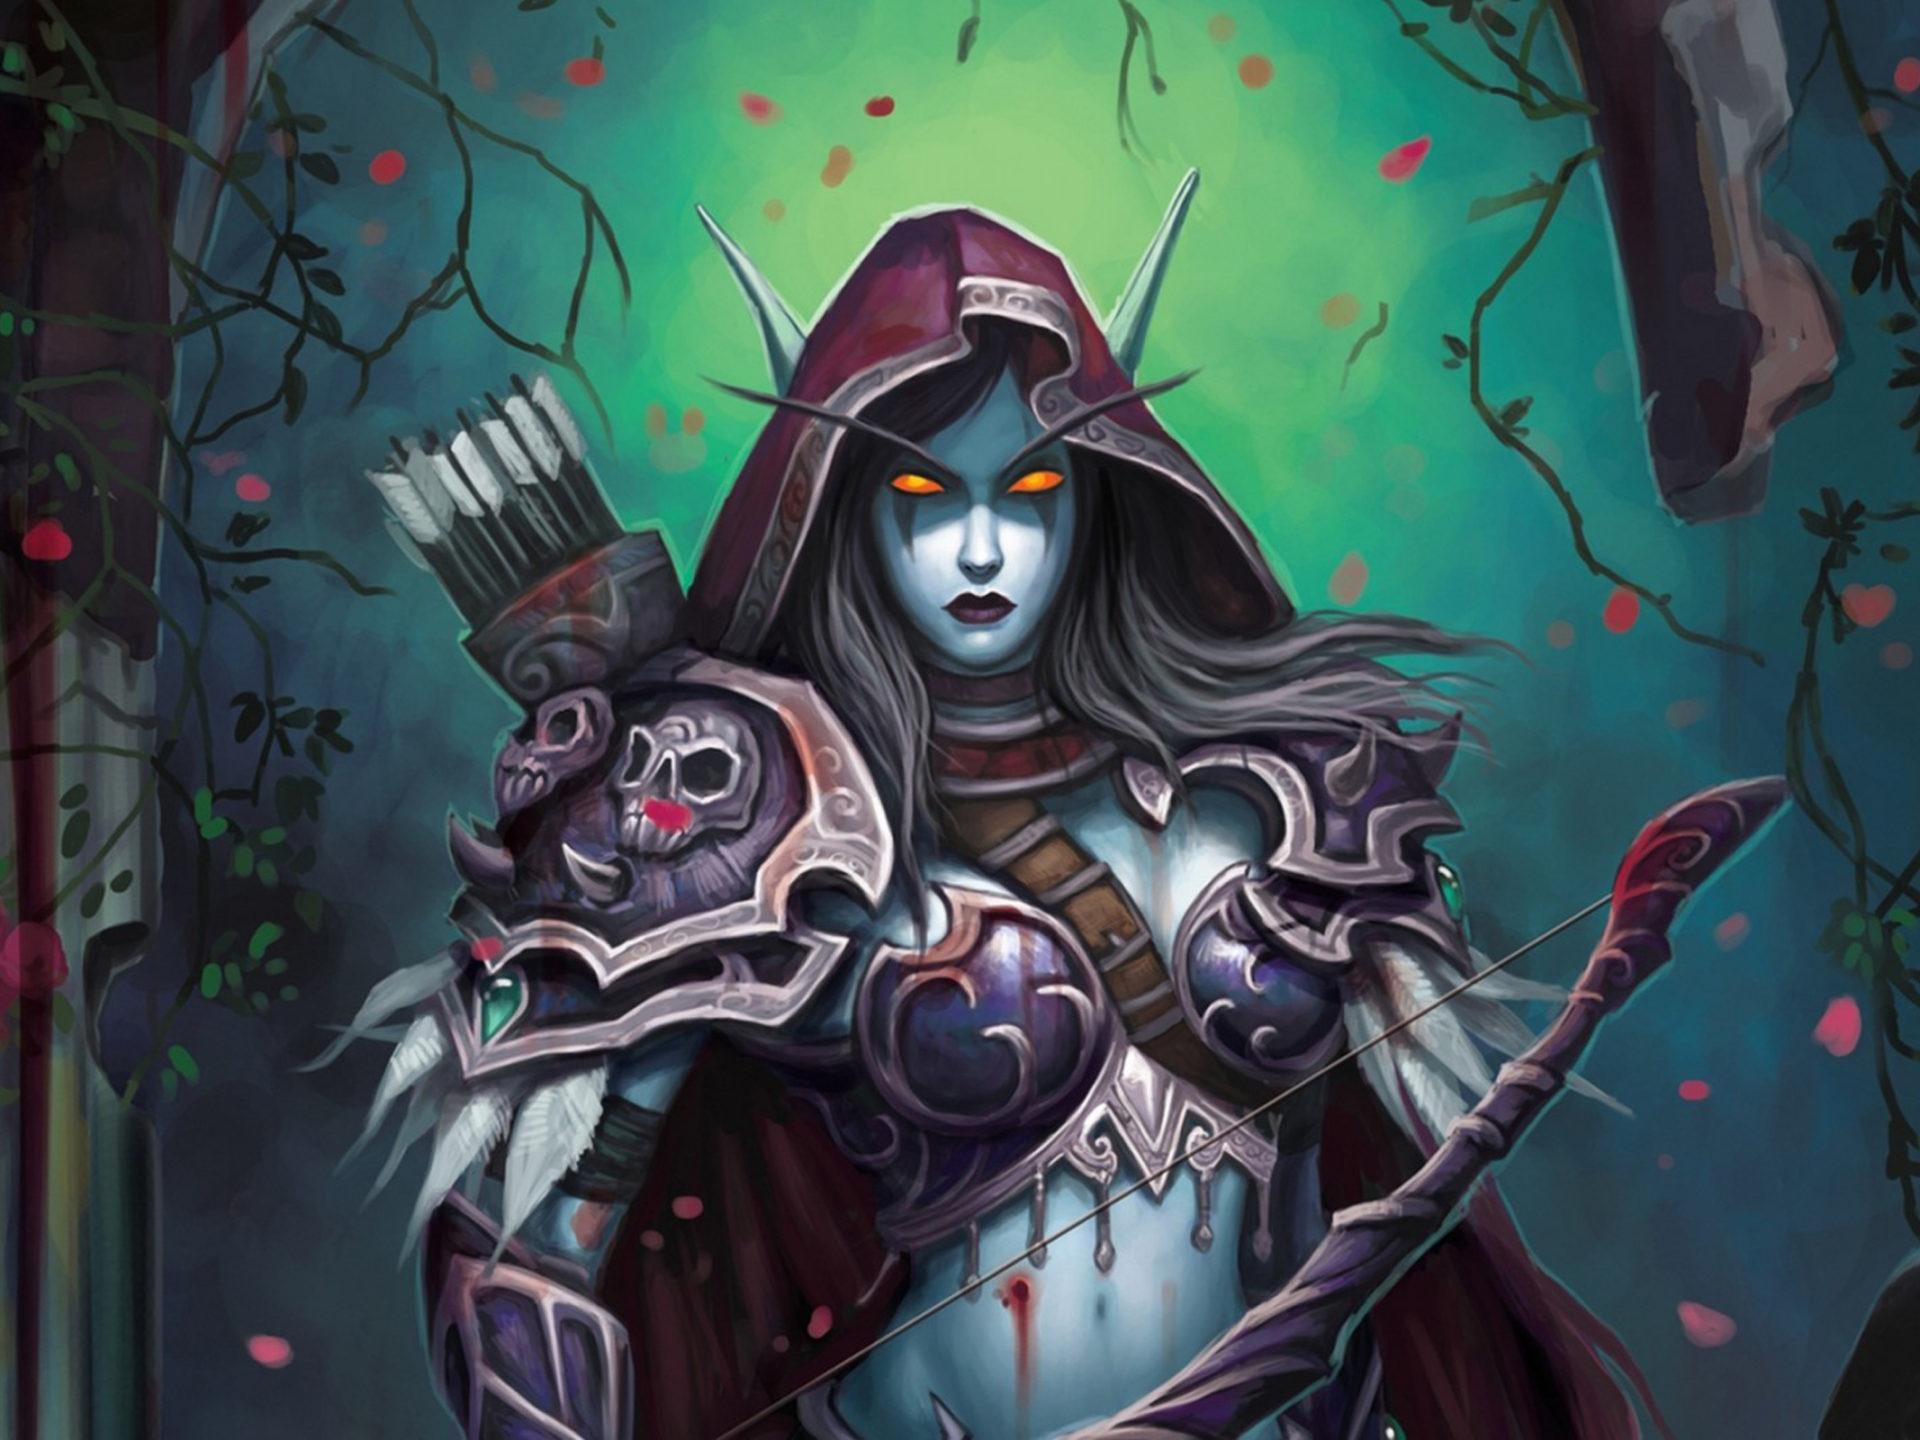 Hunter X Hunter Iphone Wallpaper World Of Warcraft Pc Game Wow Elf Lady Sylvanas Windrunner